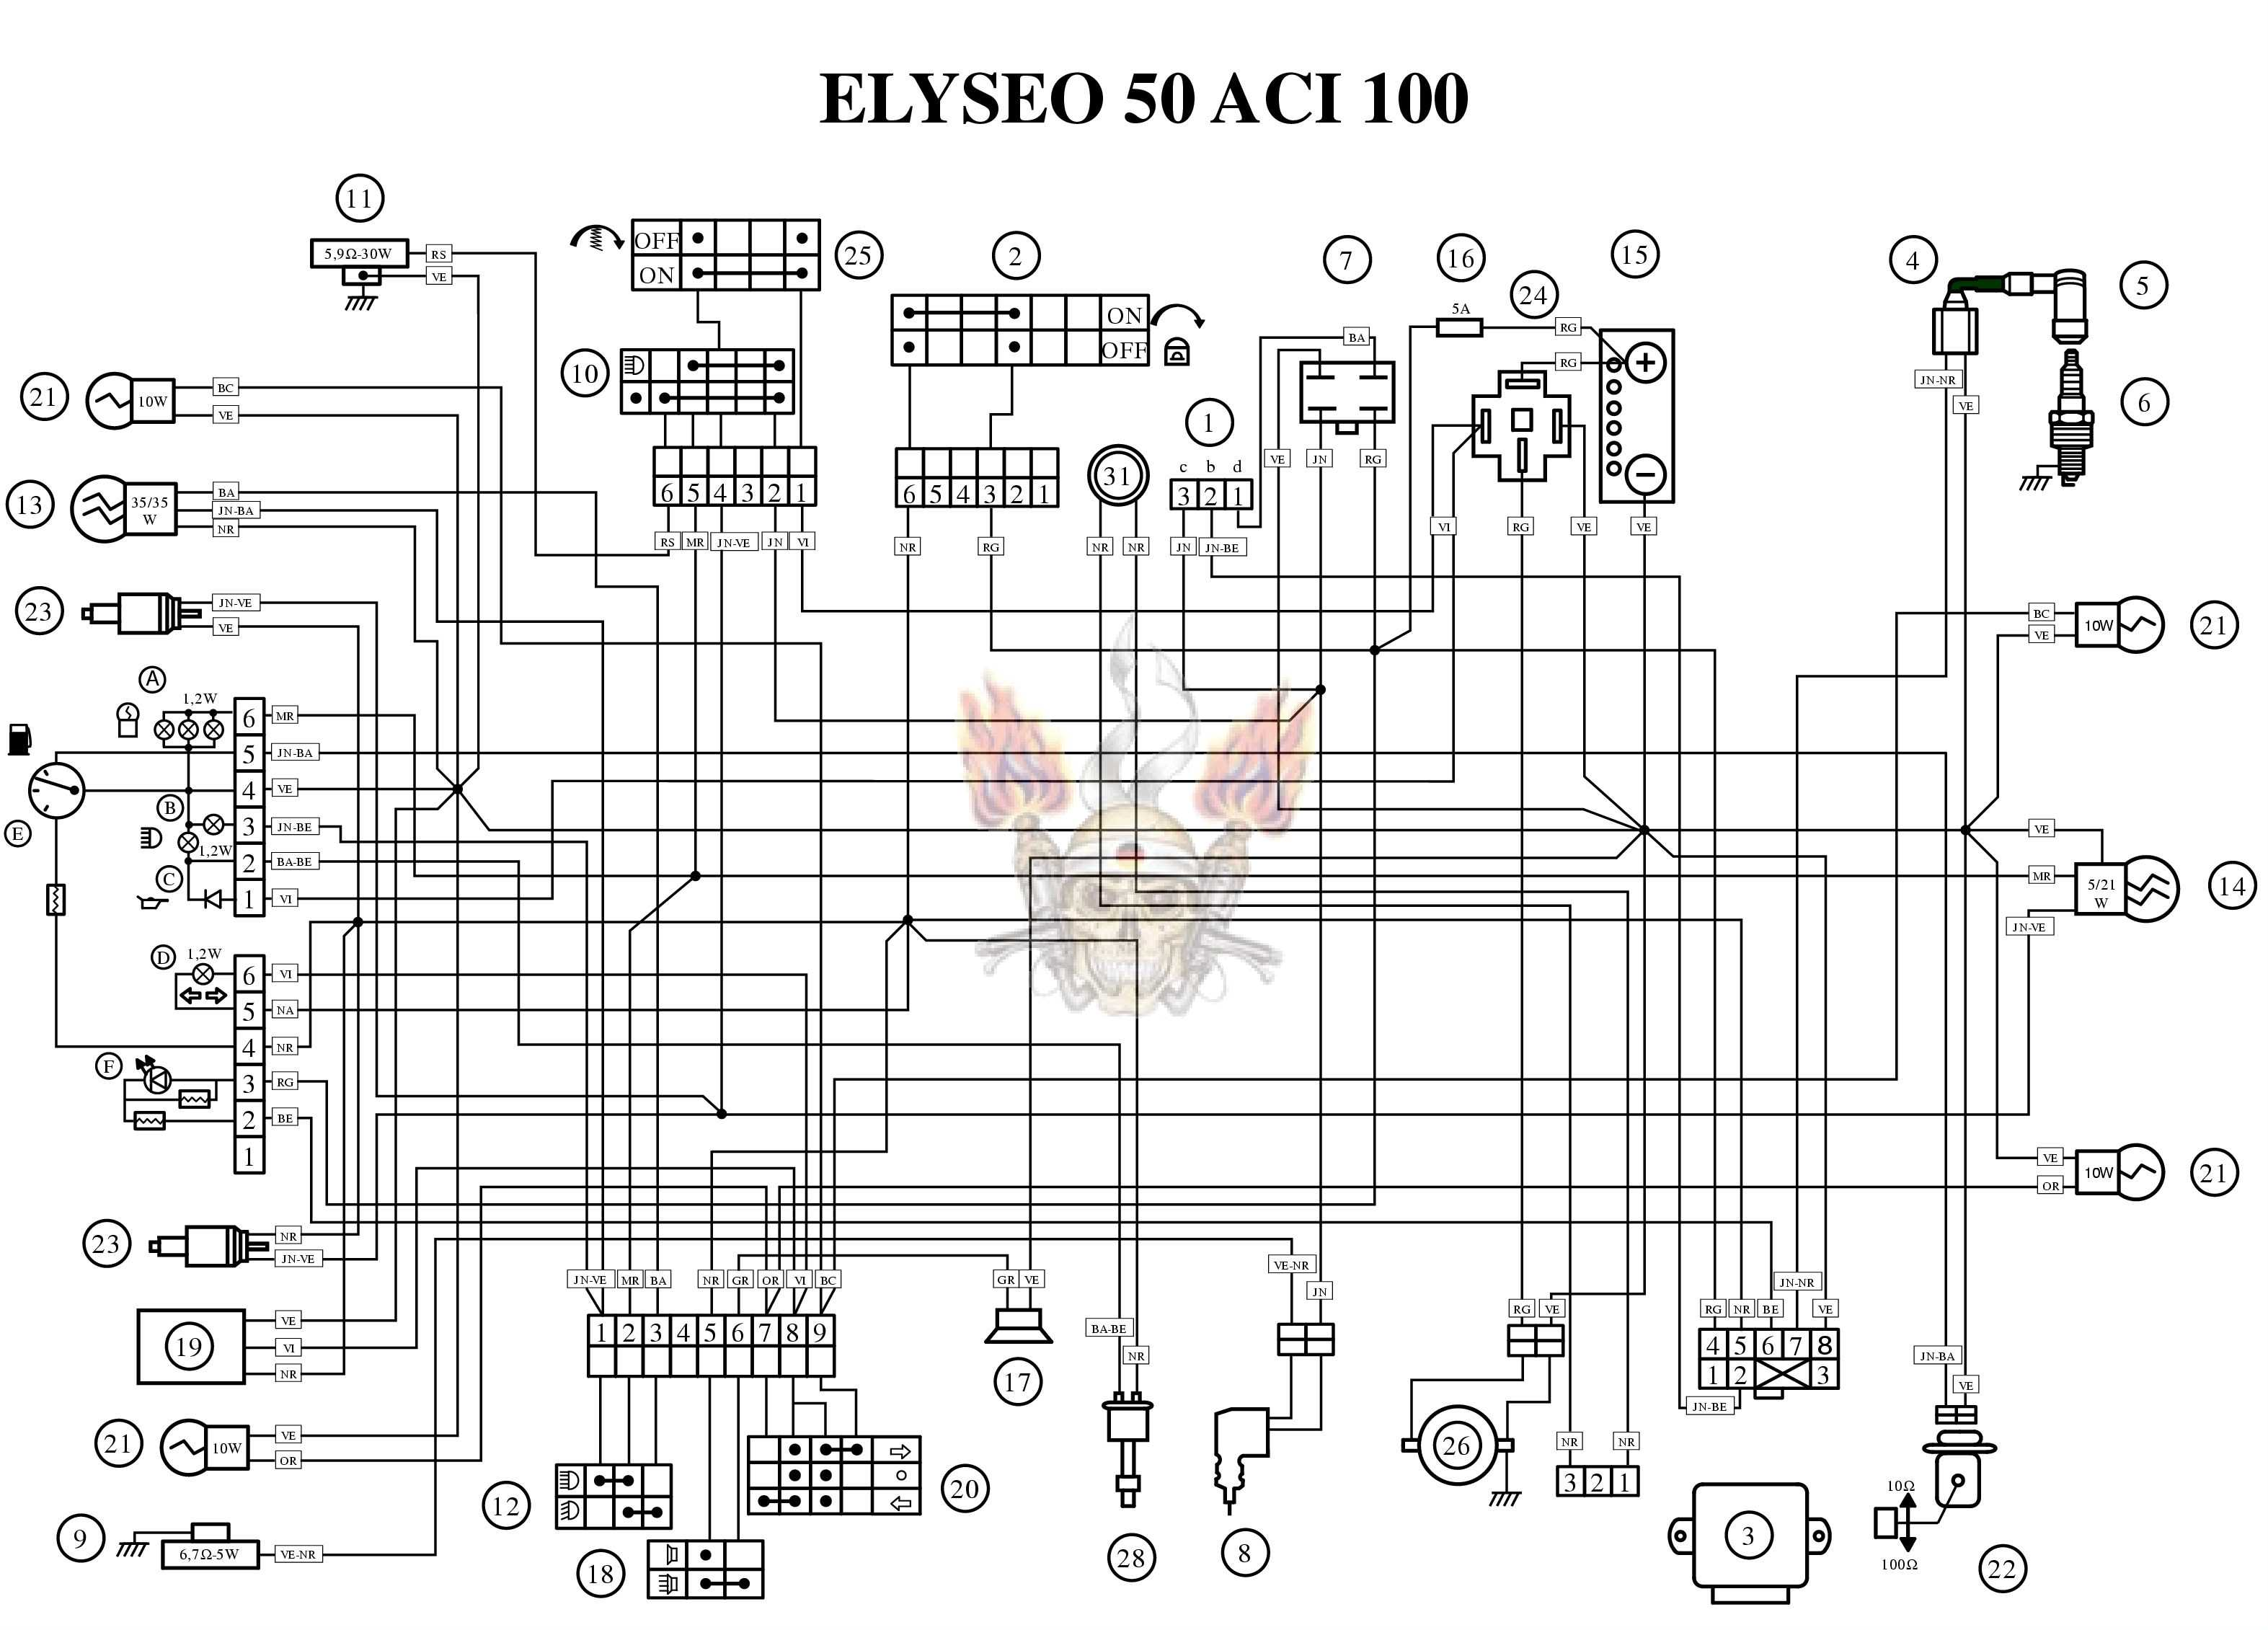 Peugeot 406 Wiring Diagram - List of Wiring Diagrams on